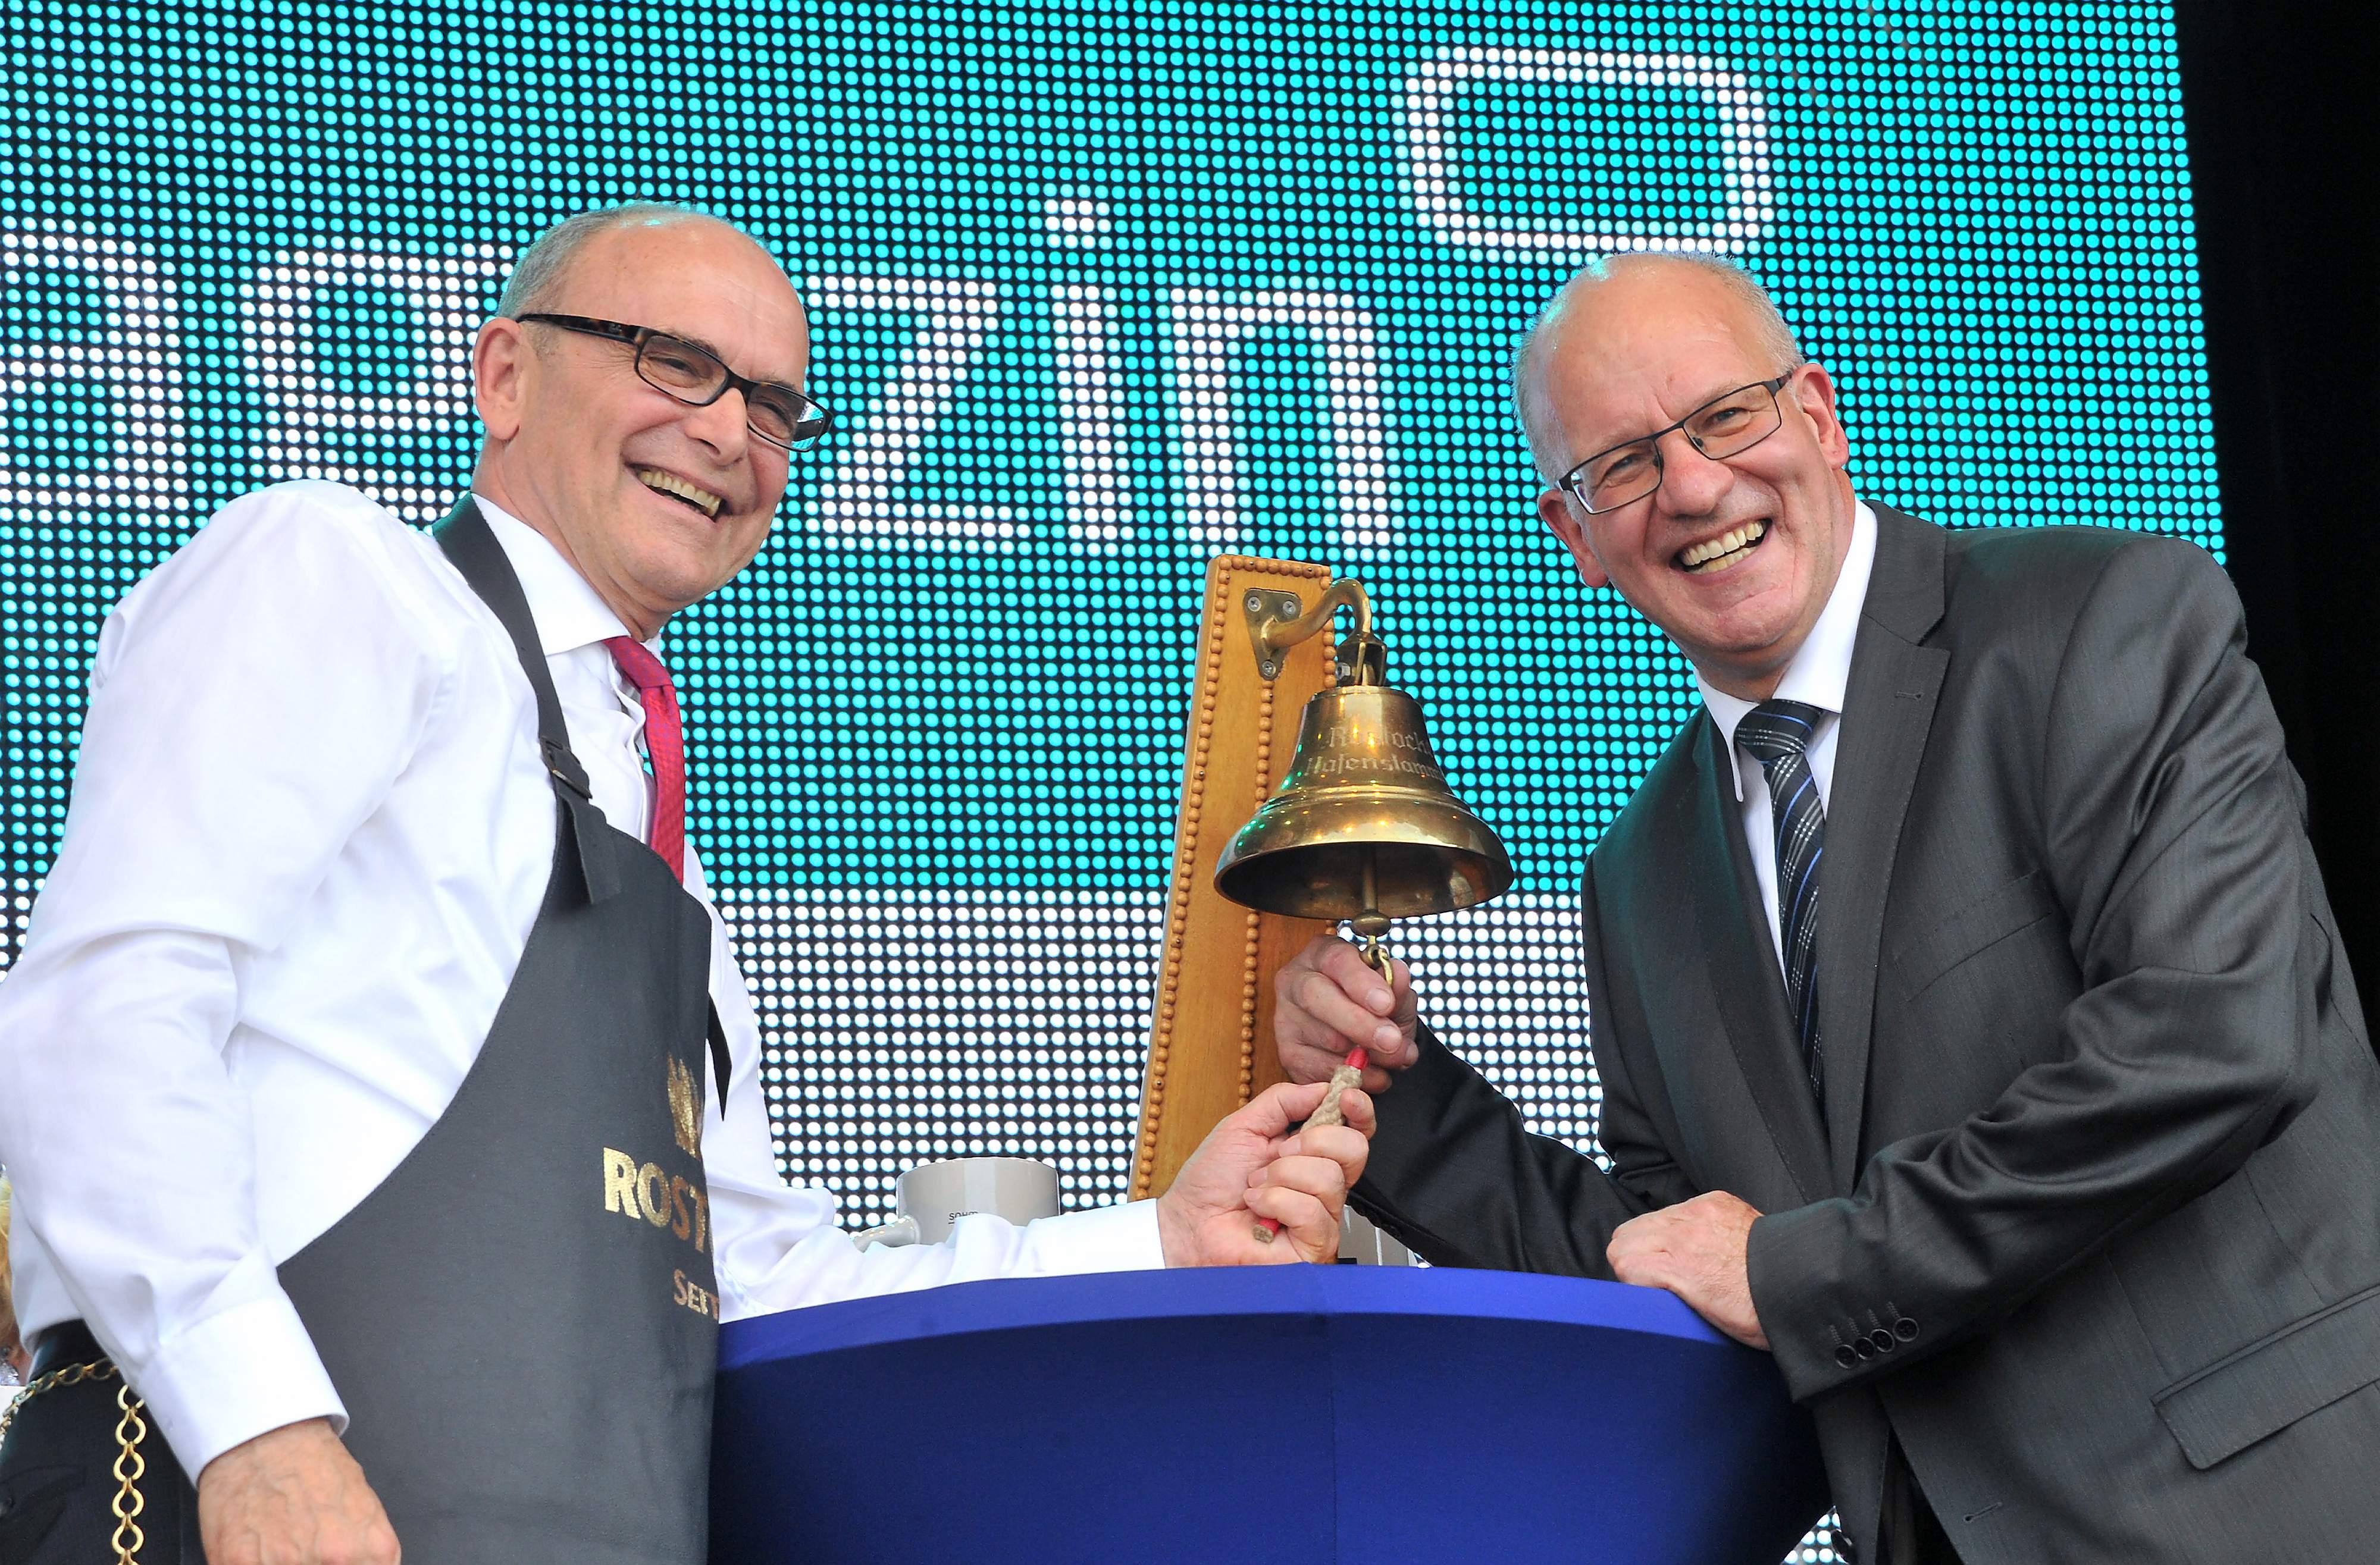 Eröffnung der 25. Hanse Sail in Rostock. Foto: Joachim Kloock